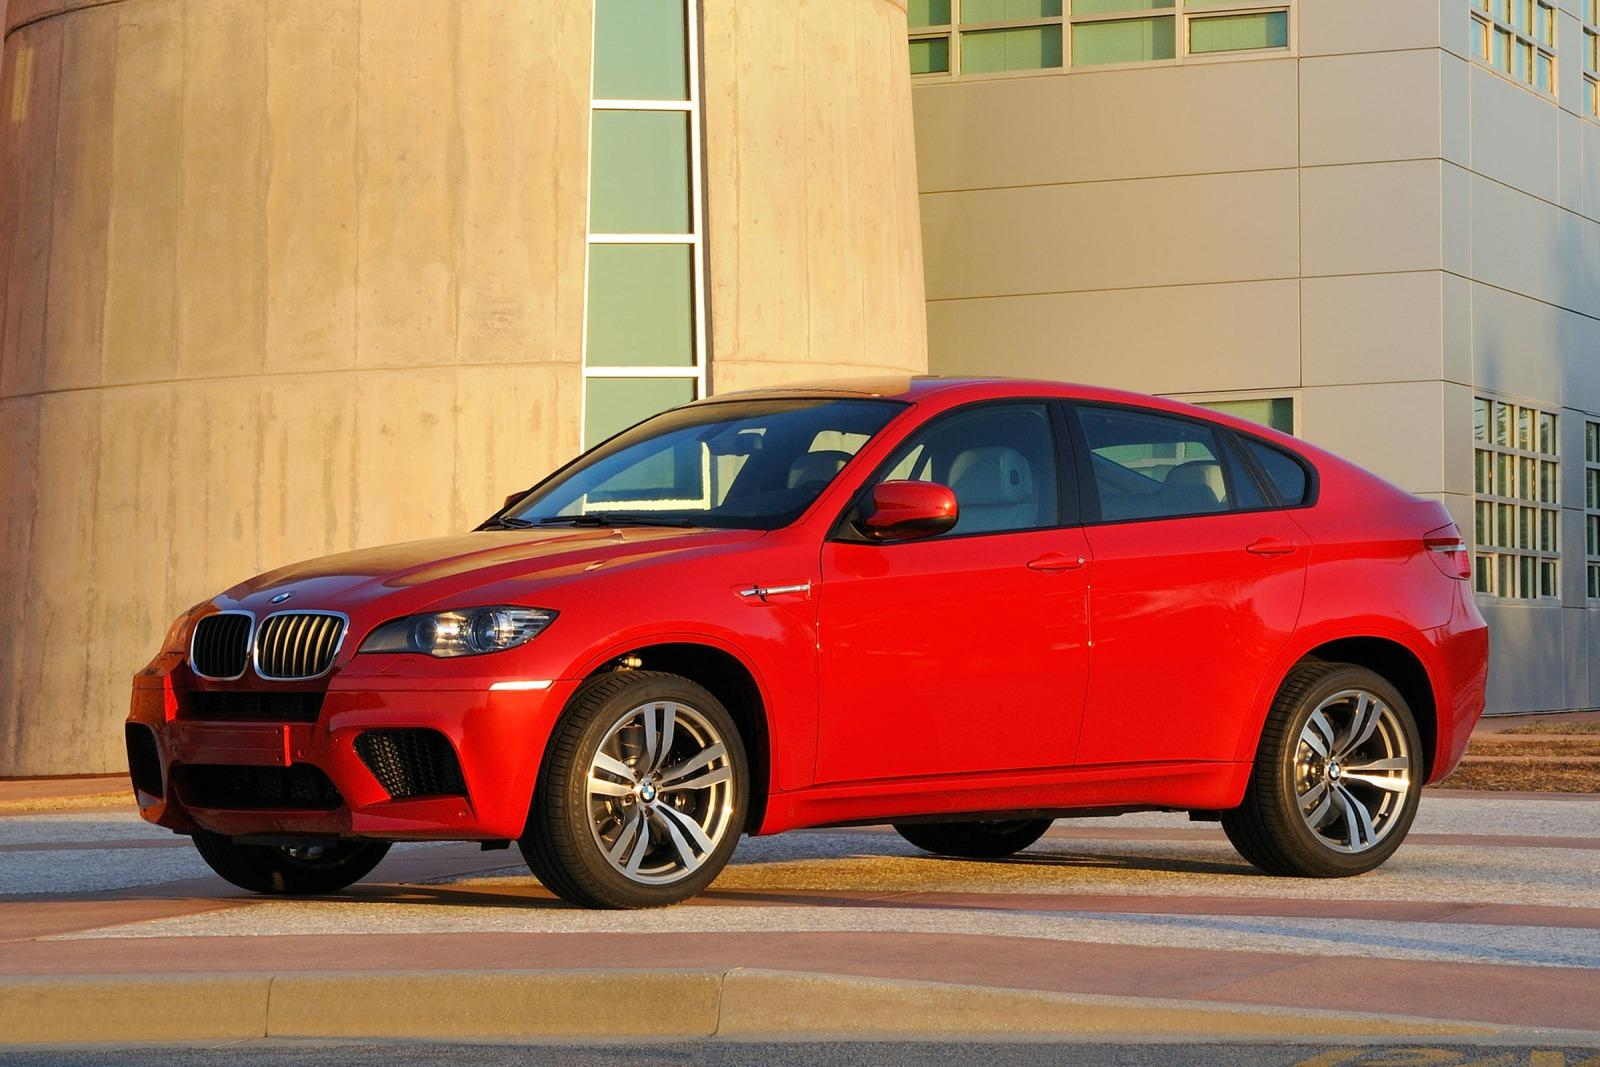 2011 BMW X6 M 4dr SUV Int Interior 3 800 1024 1280 1600 Origin